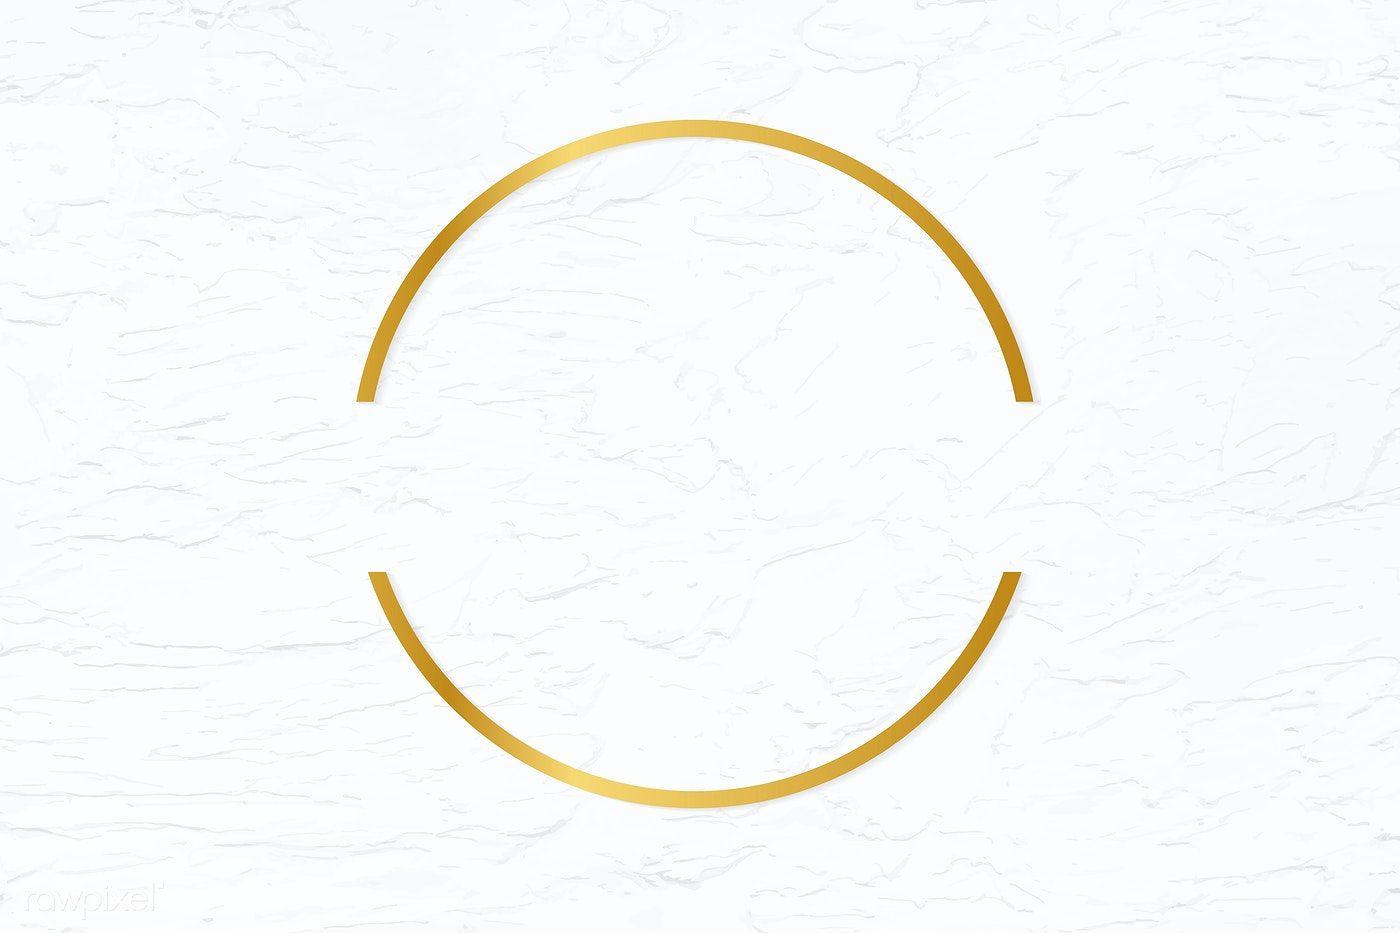 Golden Framed Semicircle On A Stucco Wall Textured Vector Free Image By Rawpixel Com Adj Frame Logo Gold Circle Frames Logo Design Set